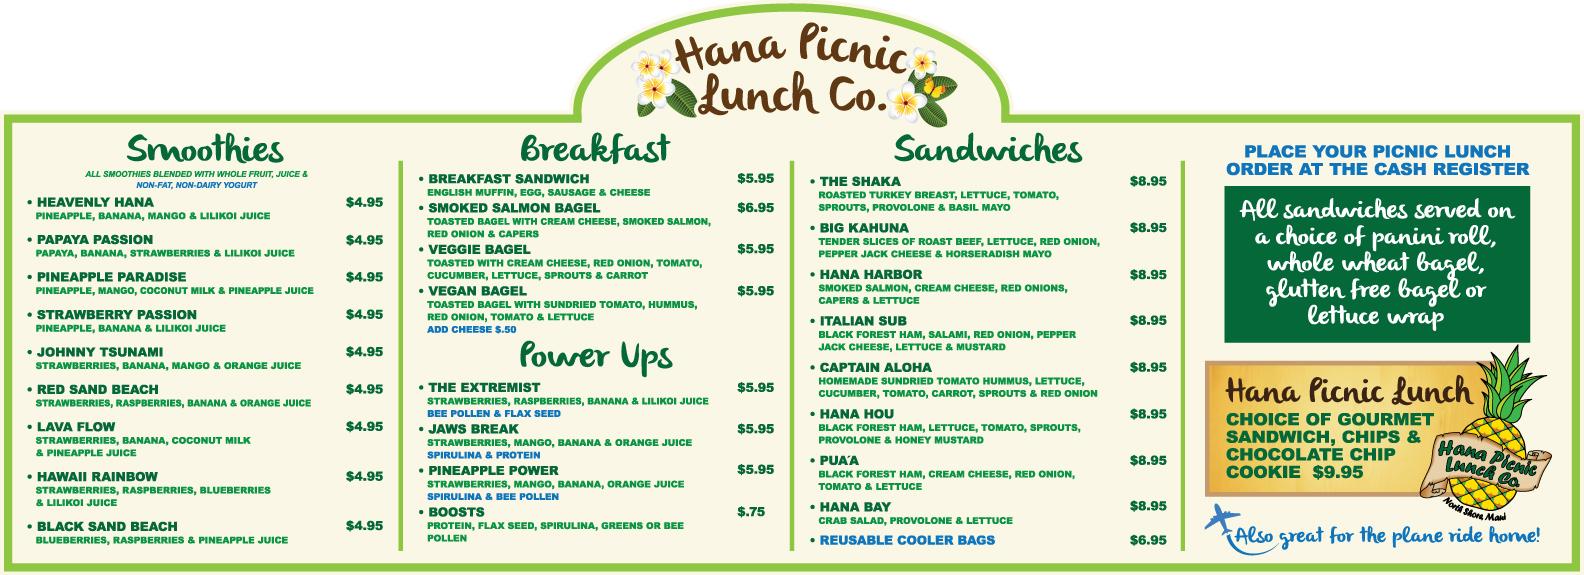 Hana Headquarters Food To Go MENU